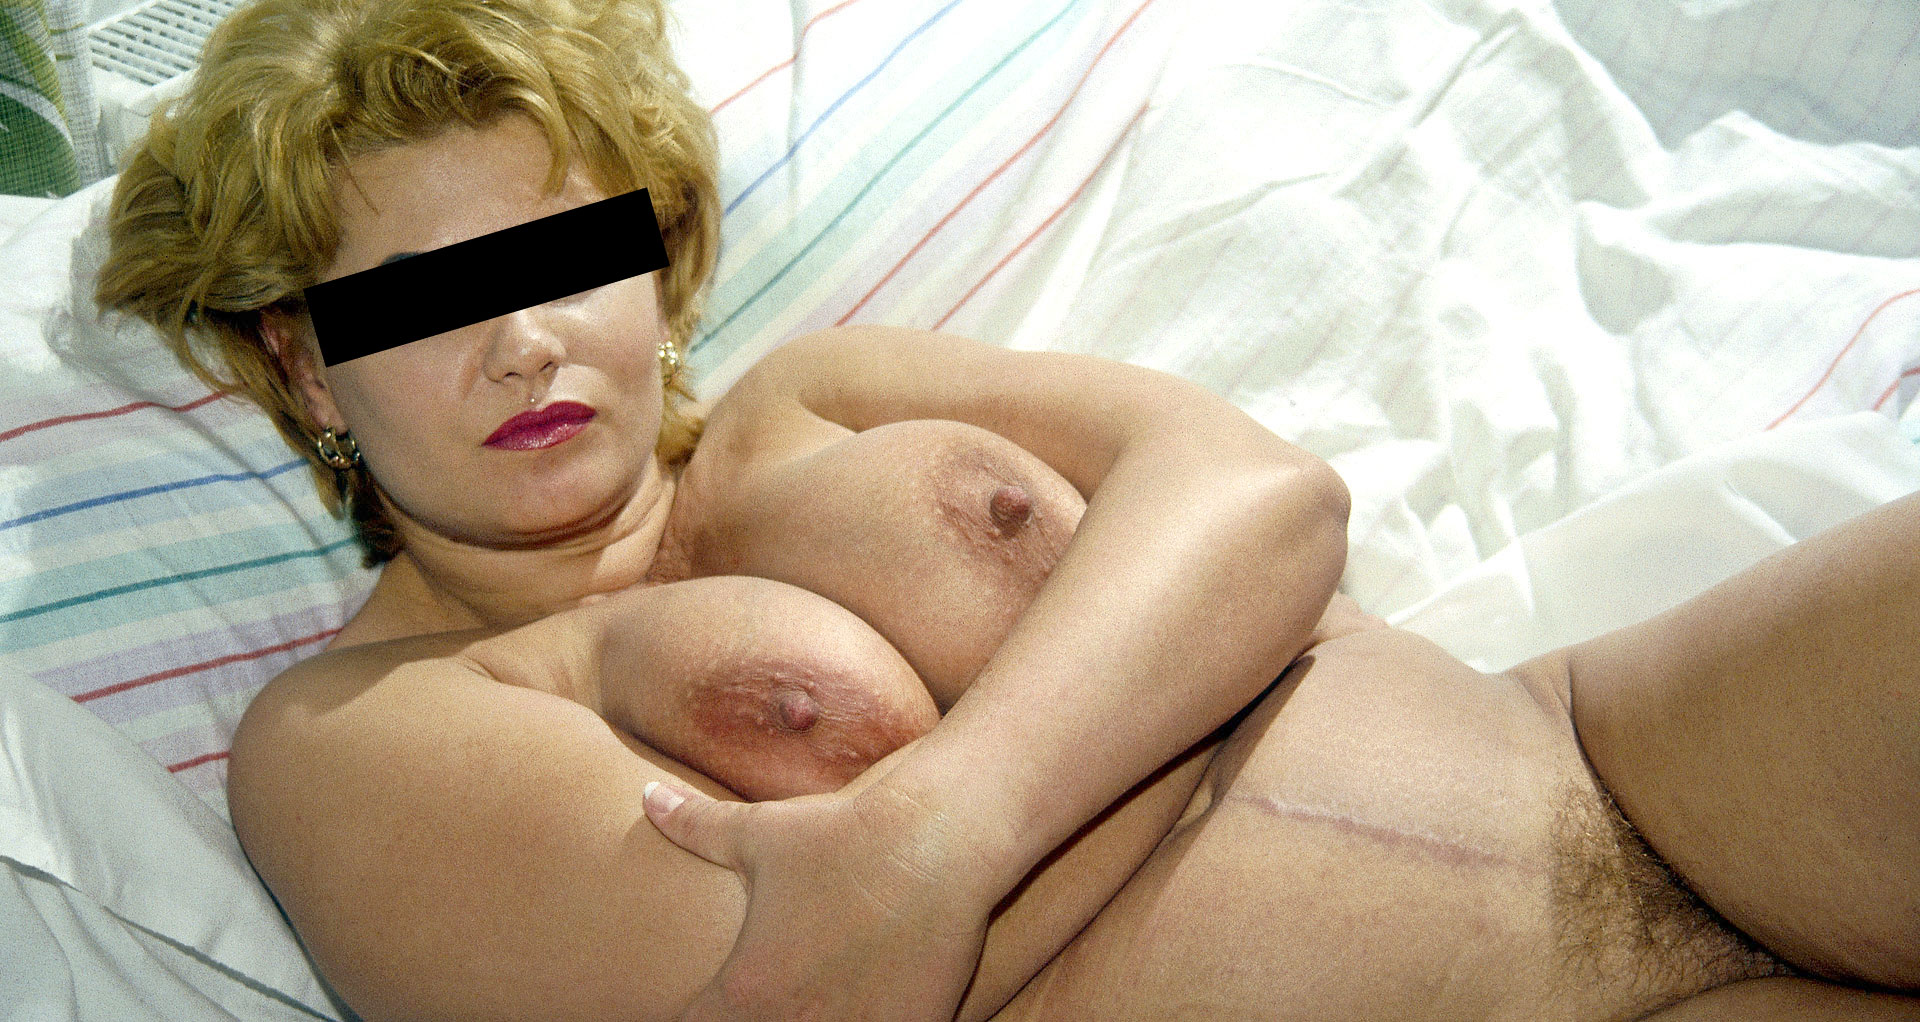 sexgeschichten schweiz cuckold club